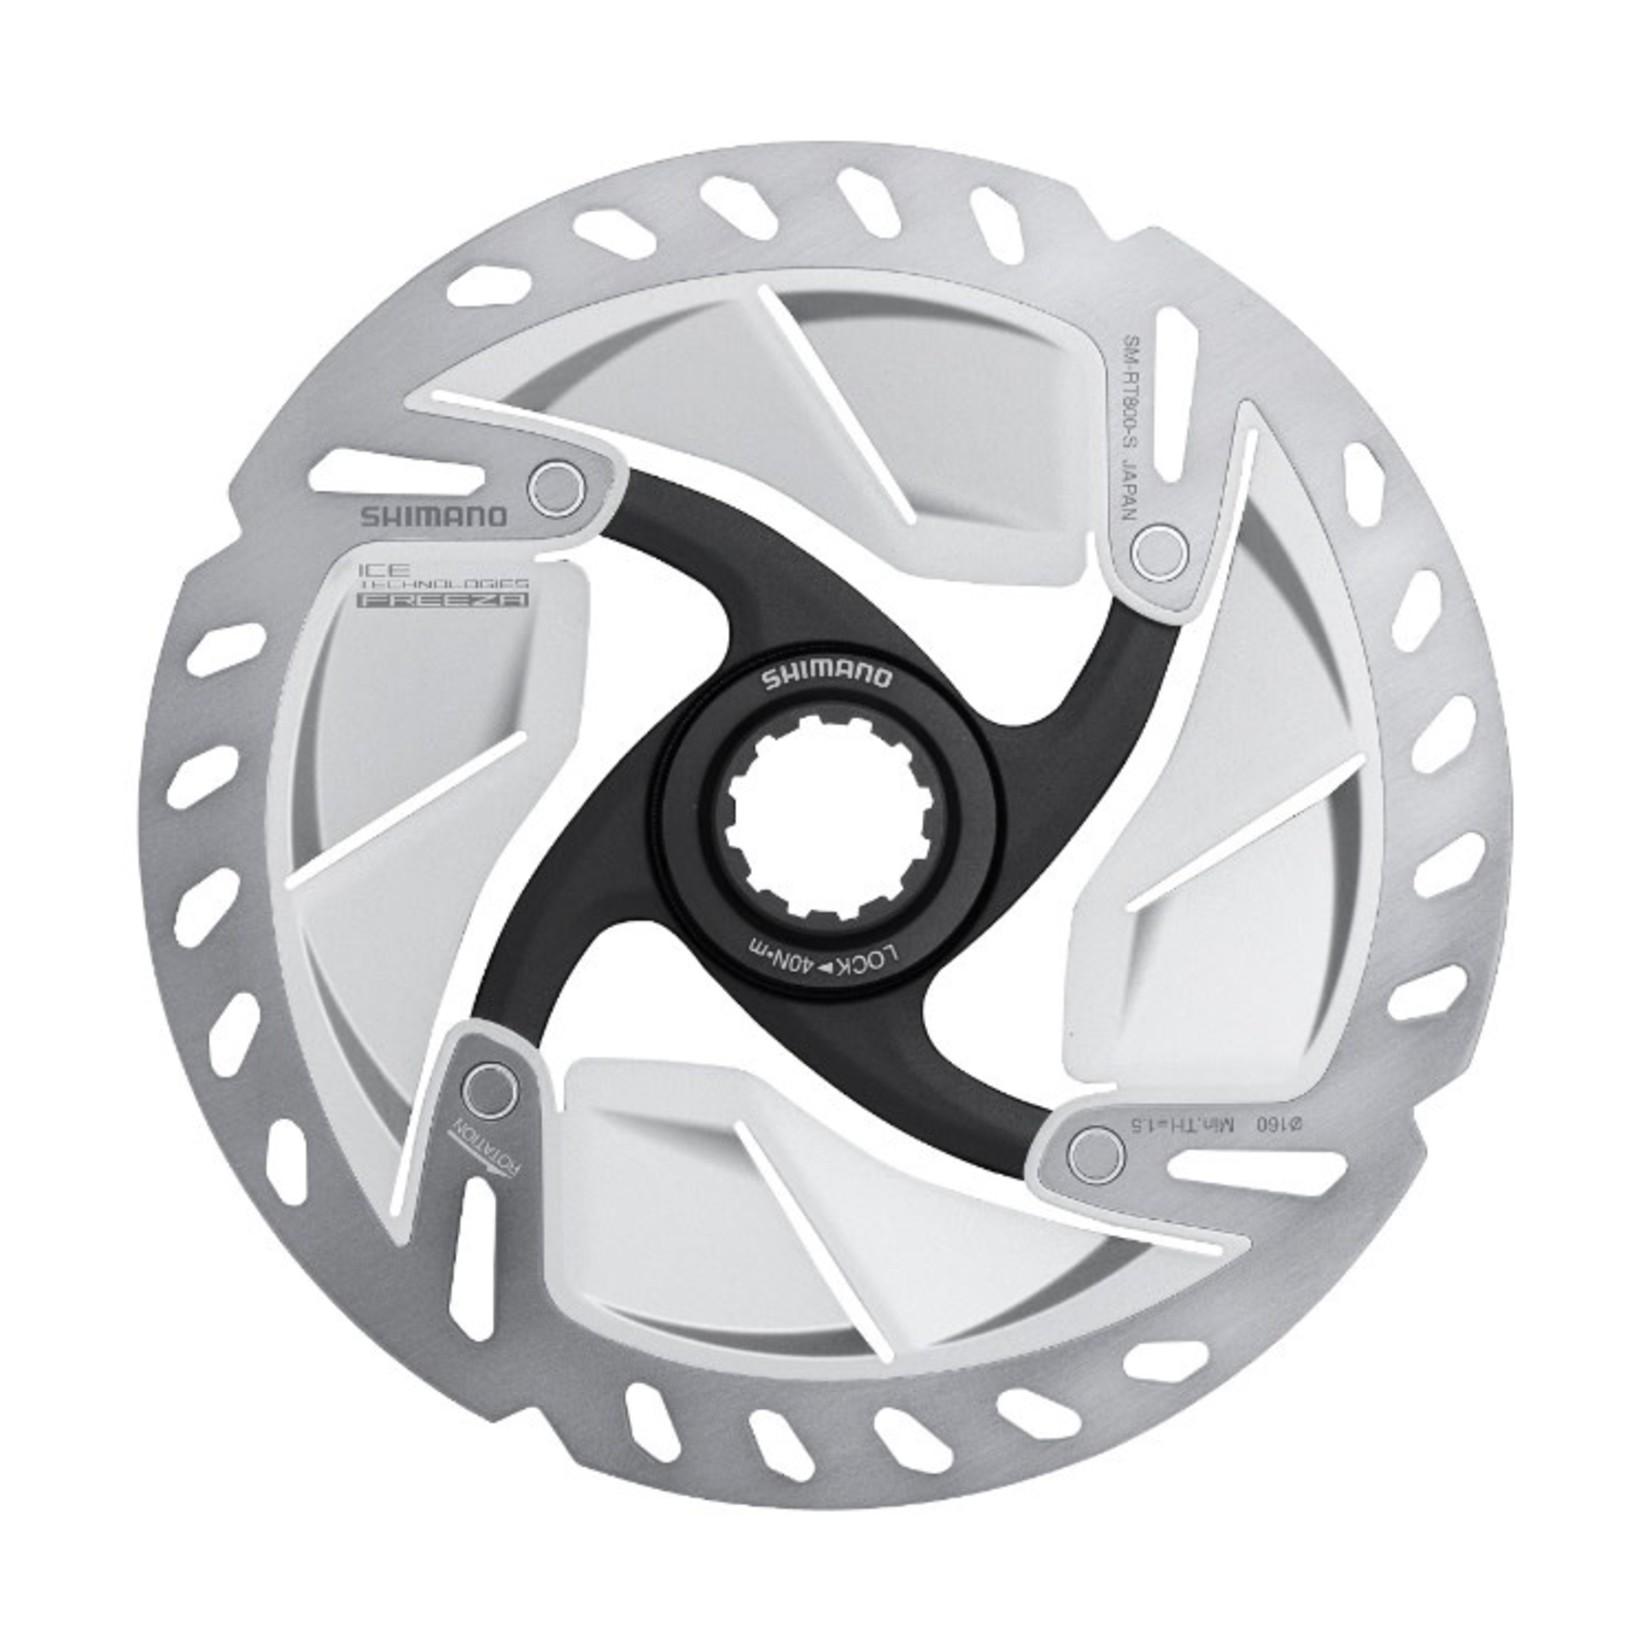 Shimano Ultegra Disc Brake Rotor Ice-Tech SM-RT800